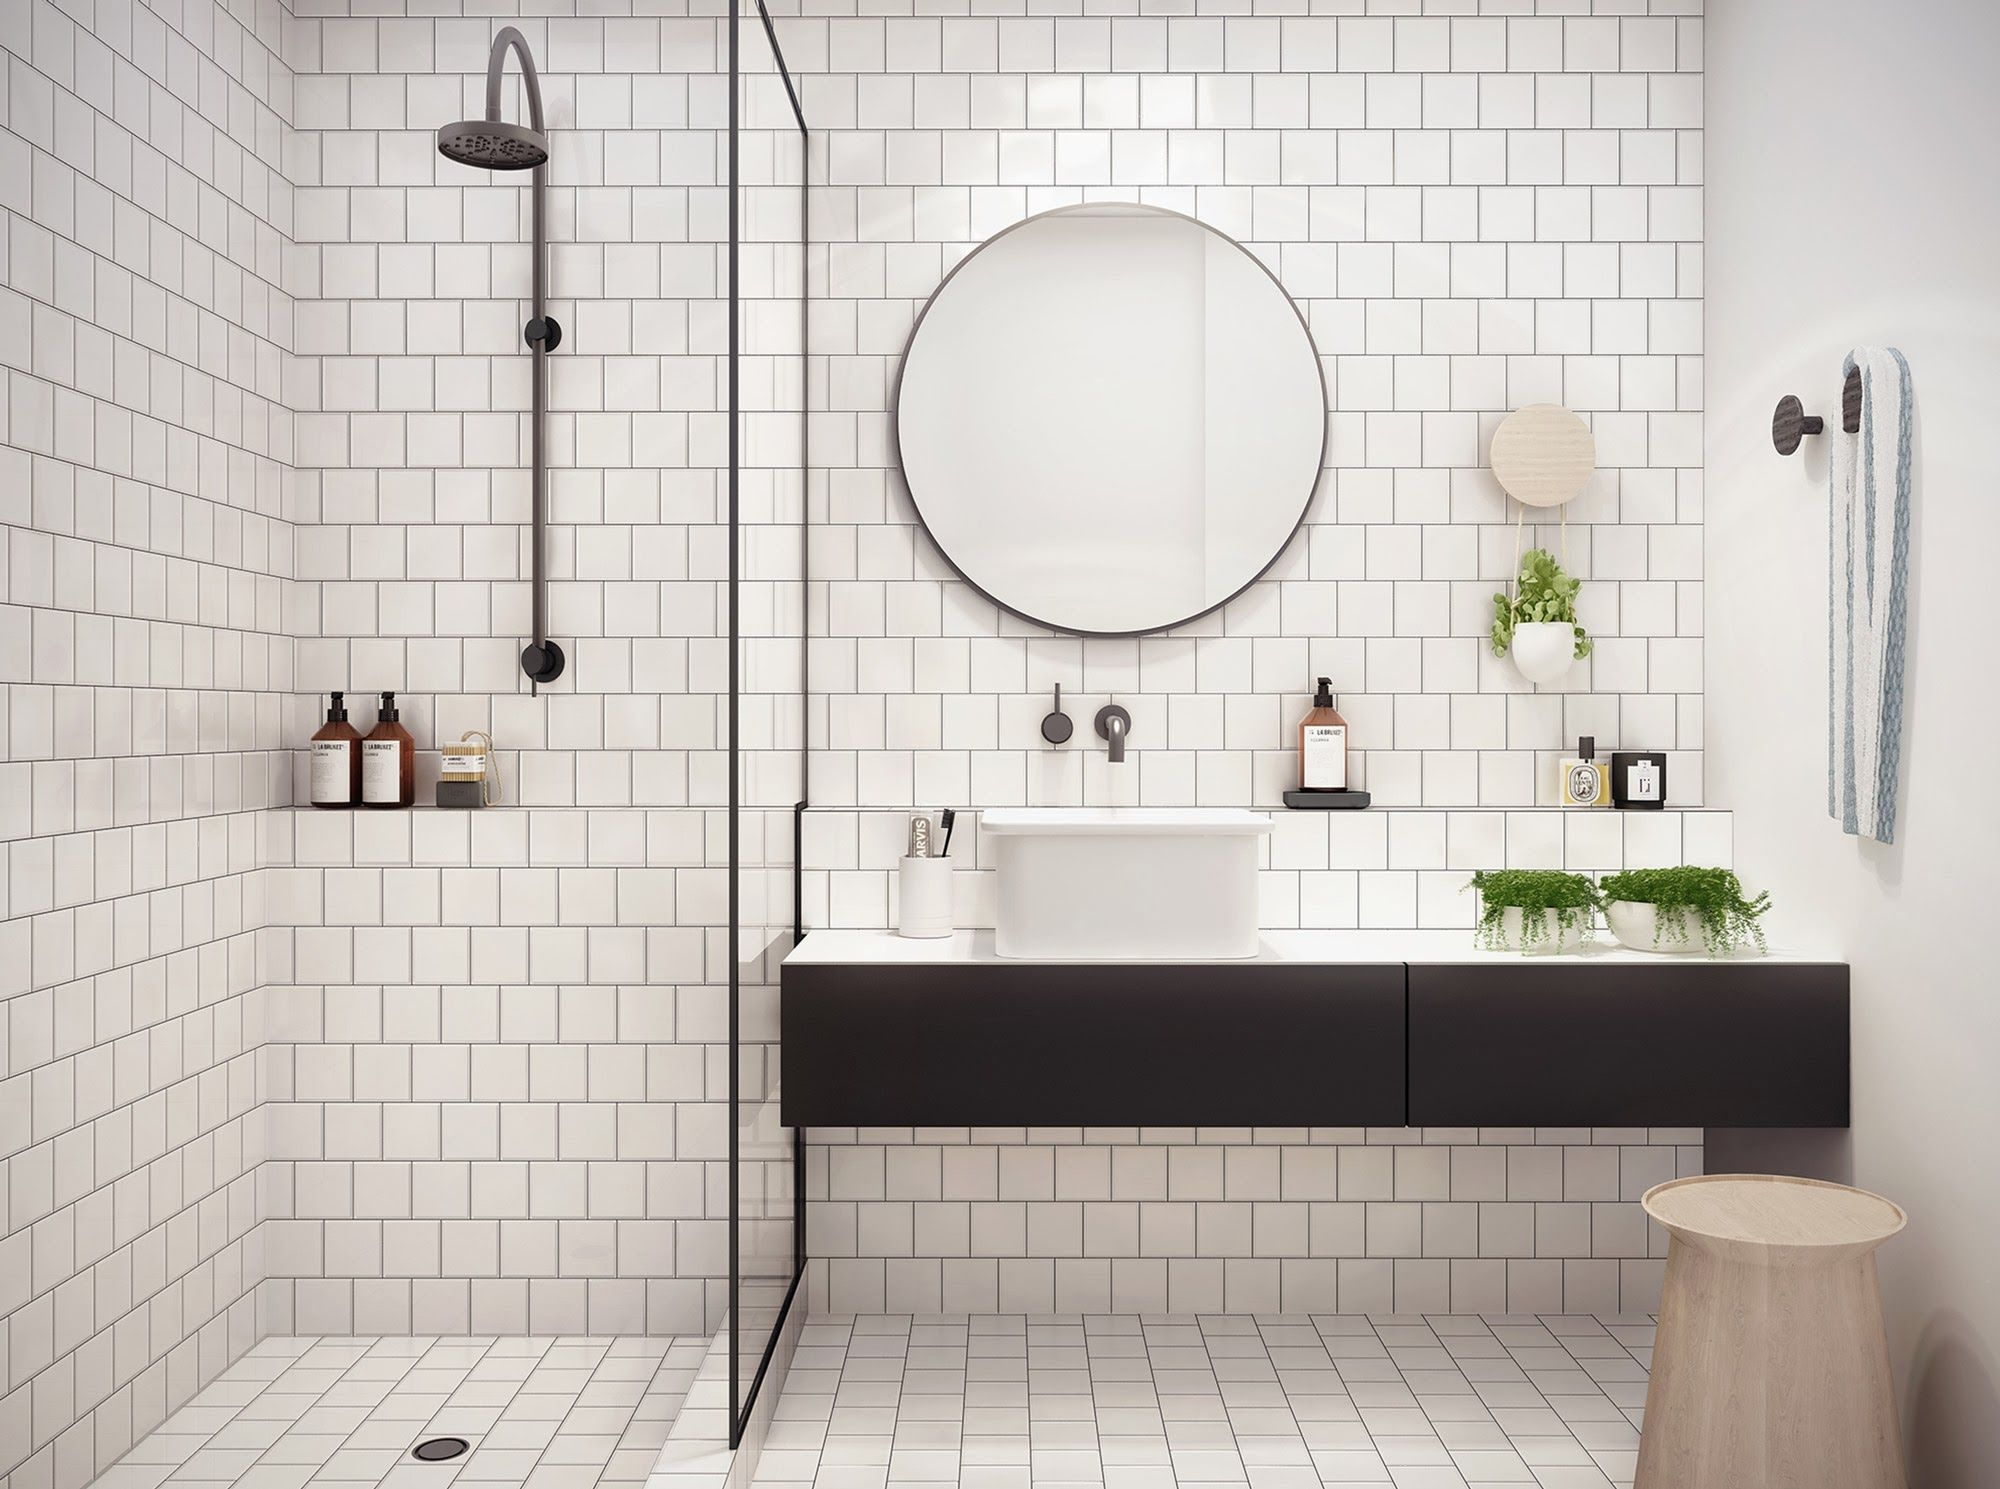 Pin by inga stirna on stirnas bathnroom salle de bain salle